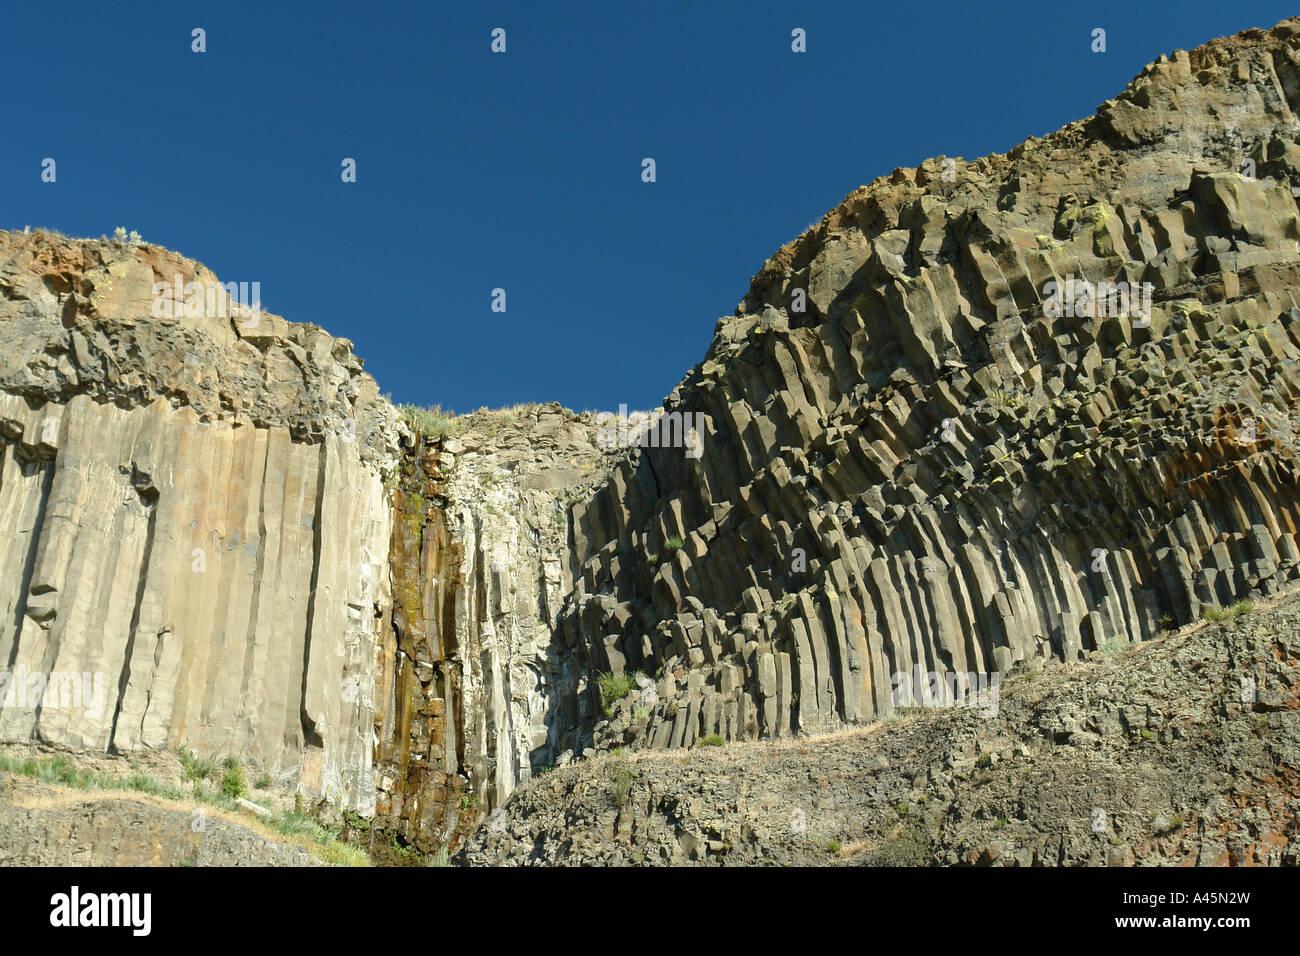 AJD55908, Grand Coulee Valley, WA, Washington, Banks Lake, Route 155 - Stock Image